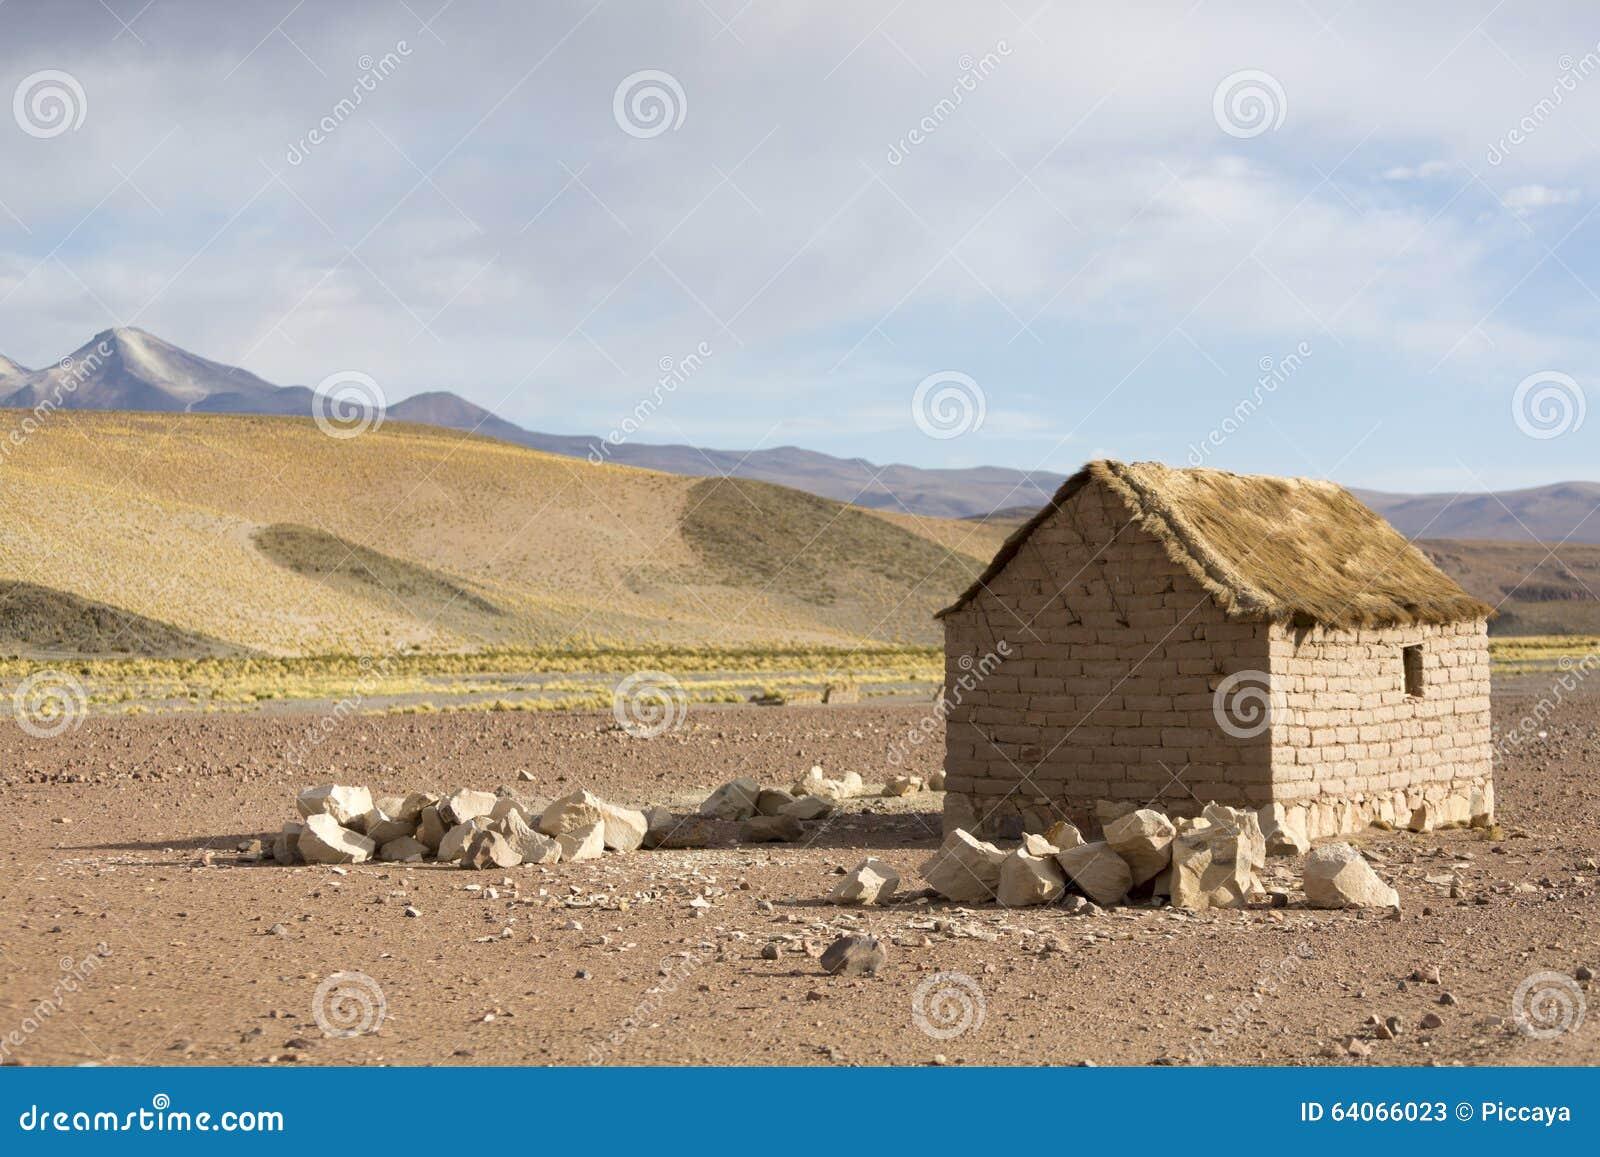 adobe house bolivian altiplano andean mountain bolivia cerrillos village near eduardo avaroa fauna national reserve 64066023